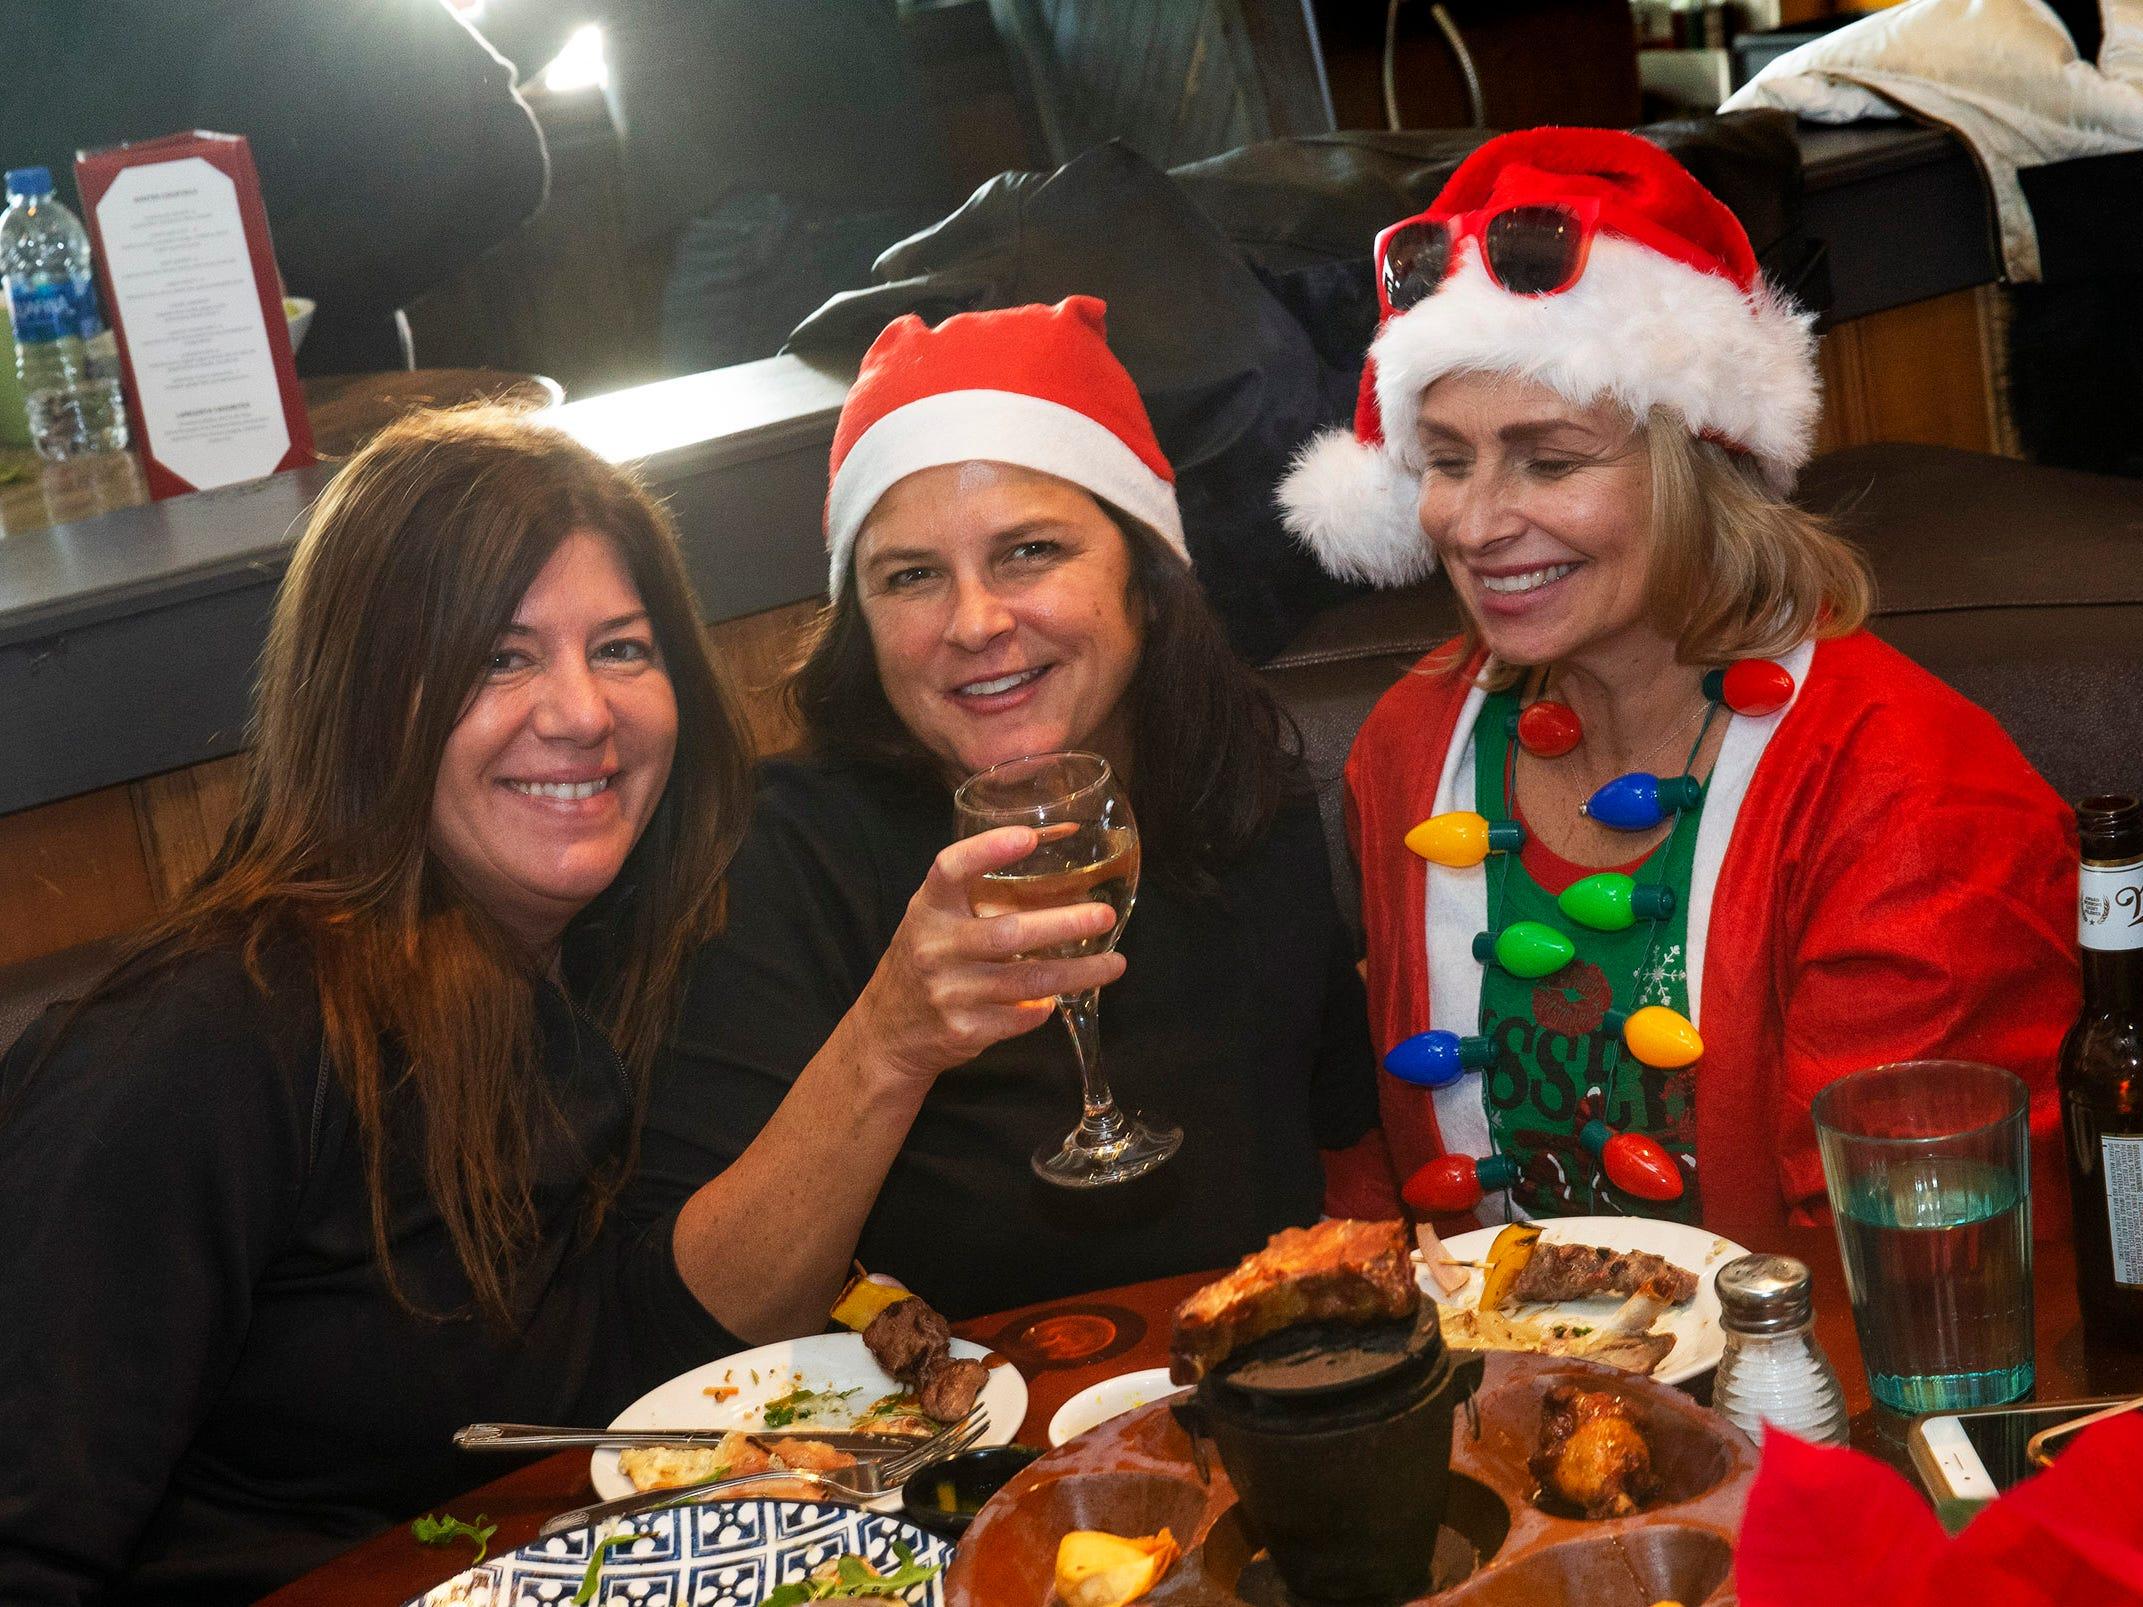 Lisa Theodore and Kim Lamberto of Oceanport and Deborah Zito of Eatontown enjoy a meal and drinks  at the Langosta Lounge during SantaCon Bar Crawl through Asbury Park on December 8, 2018.